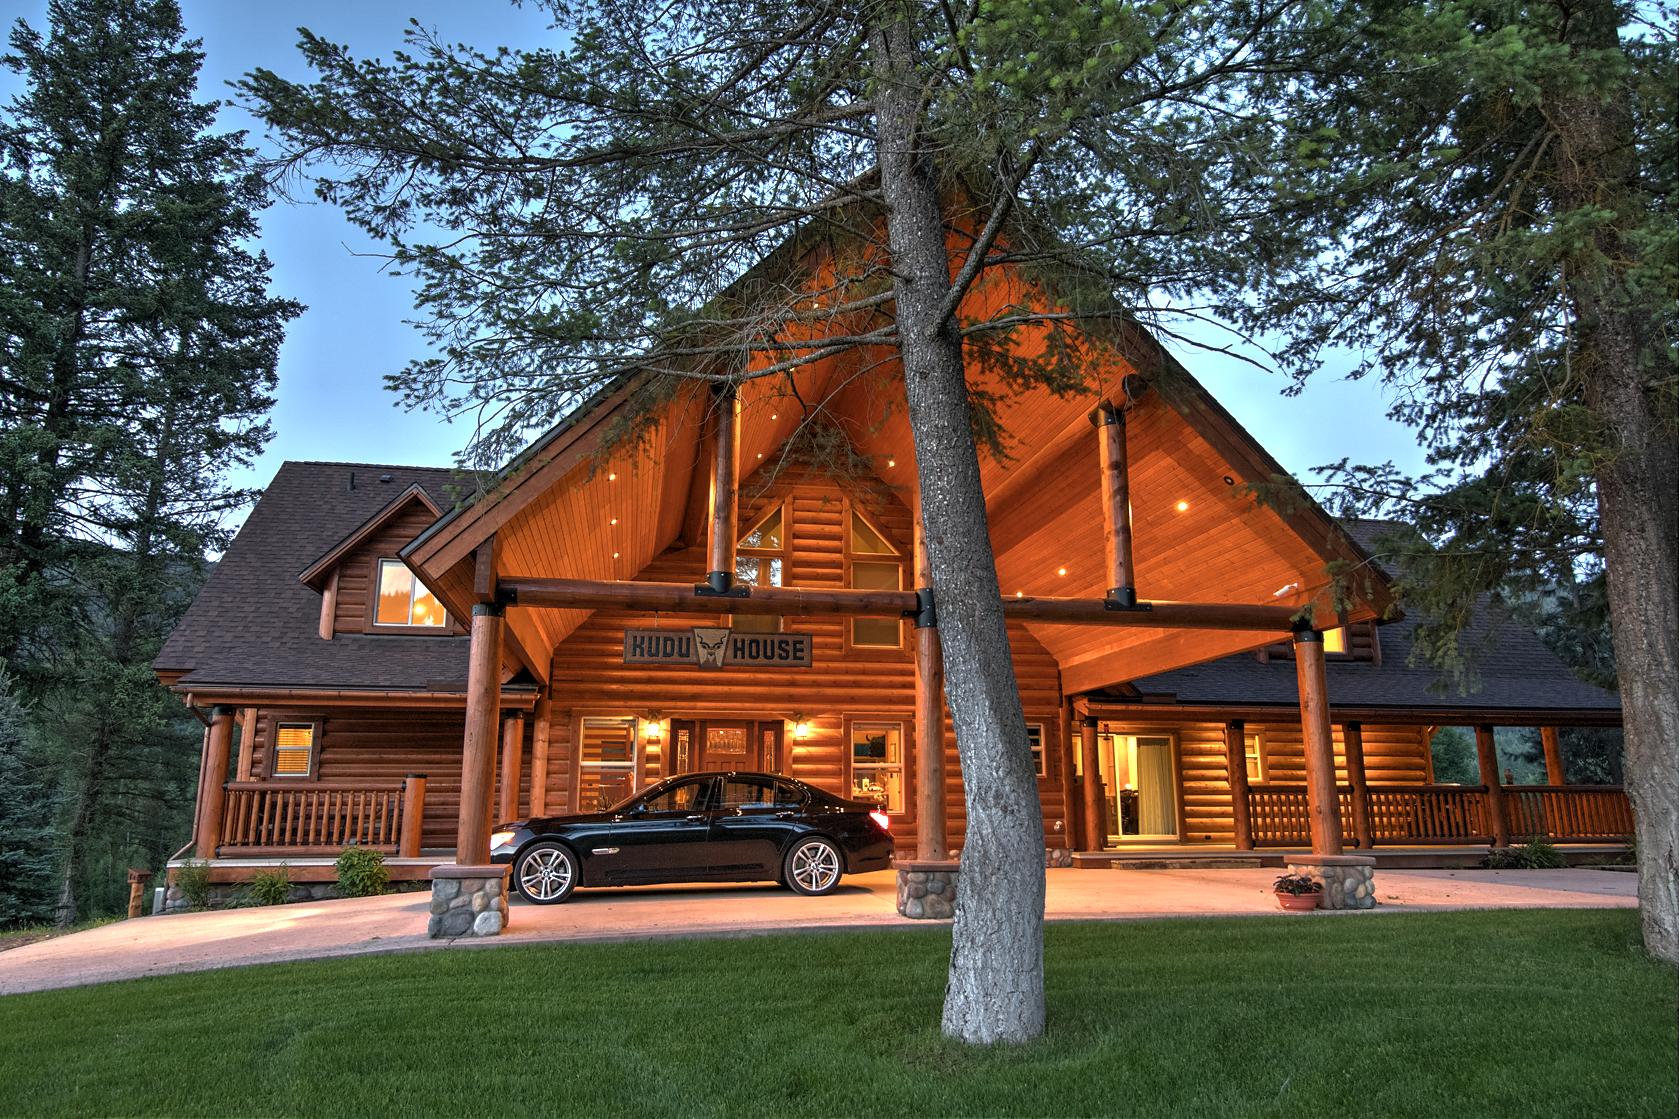 Kudos House Willow Springs Properties Elizabeth McQueen Realtor